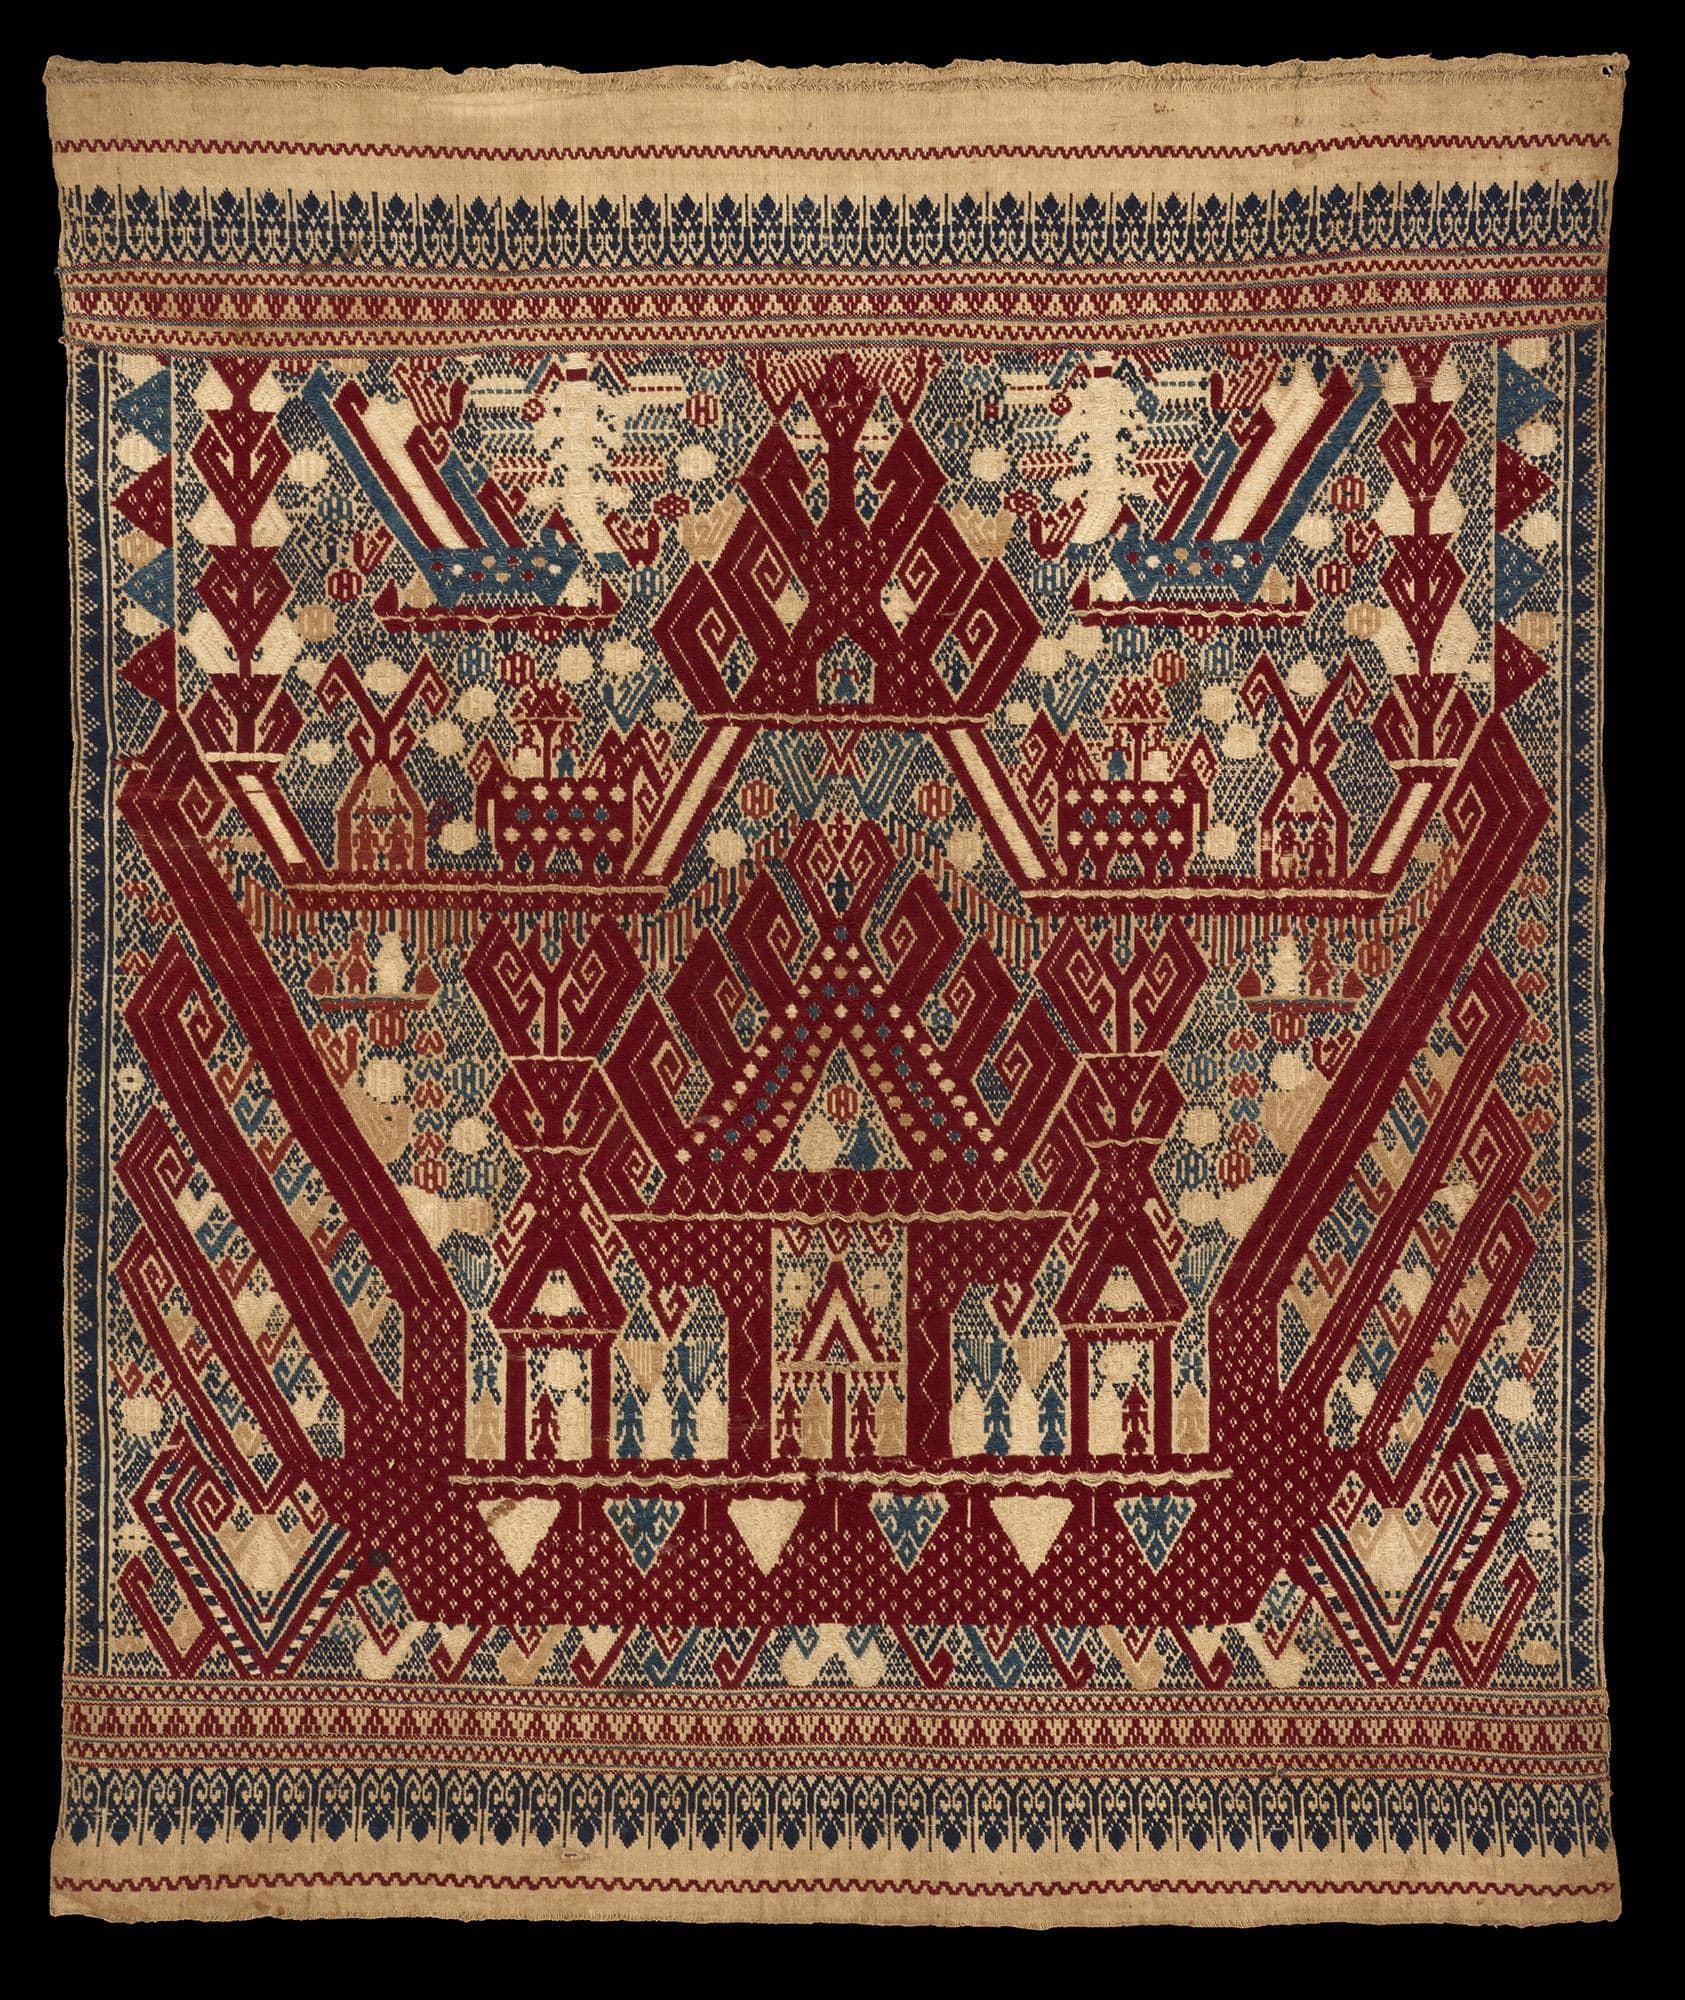 Ceremonial Cloth | Tampan © The Dallas Museum of Art | Texas, USA